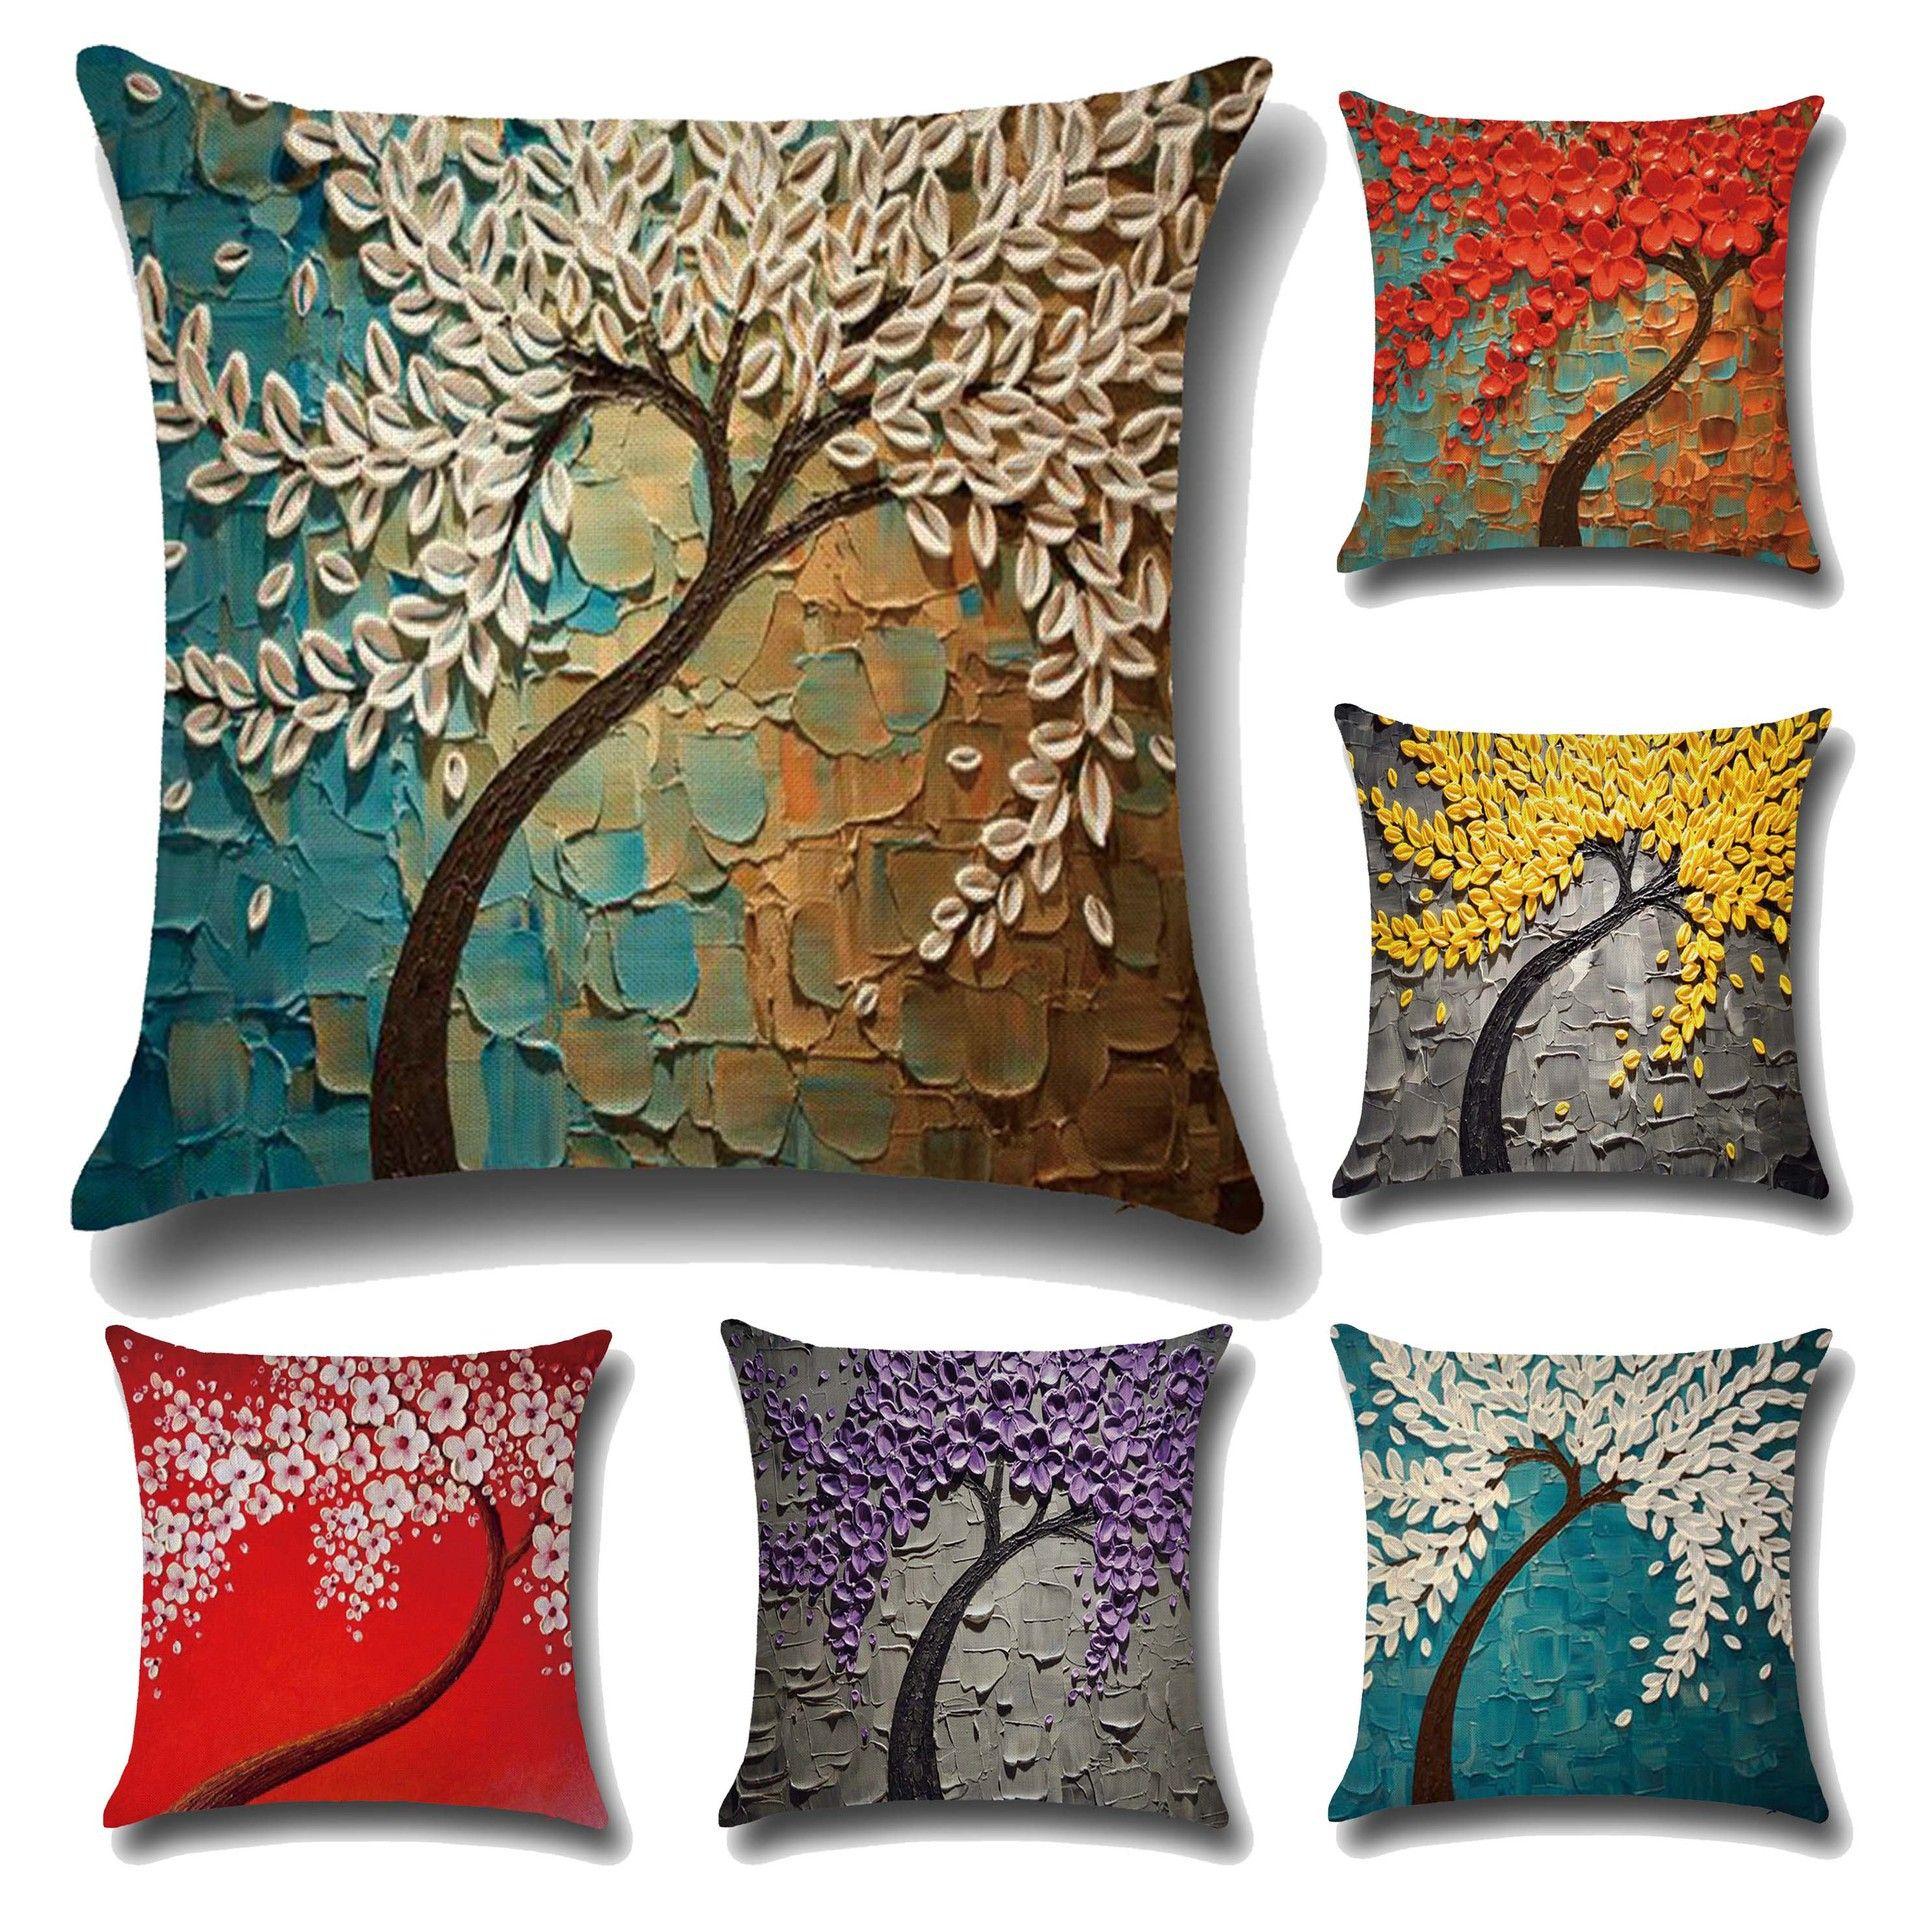 Dashing Cute Fruit Watermelon Printed Pillowcase Decorative Pillows Cushion Use For Home Sofa Car Office Lumbar Pillow 45*45cm B-076 Home & Garden